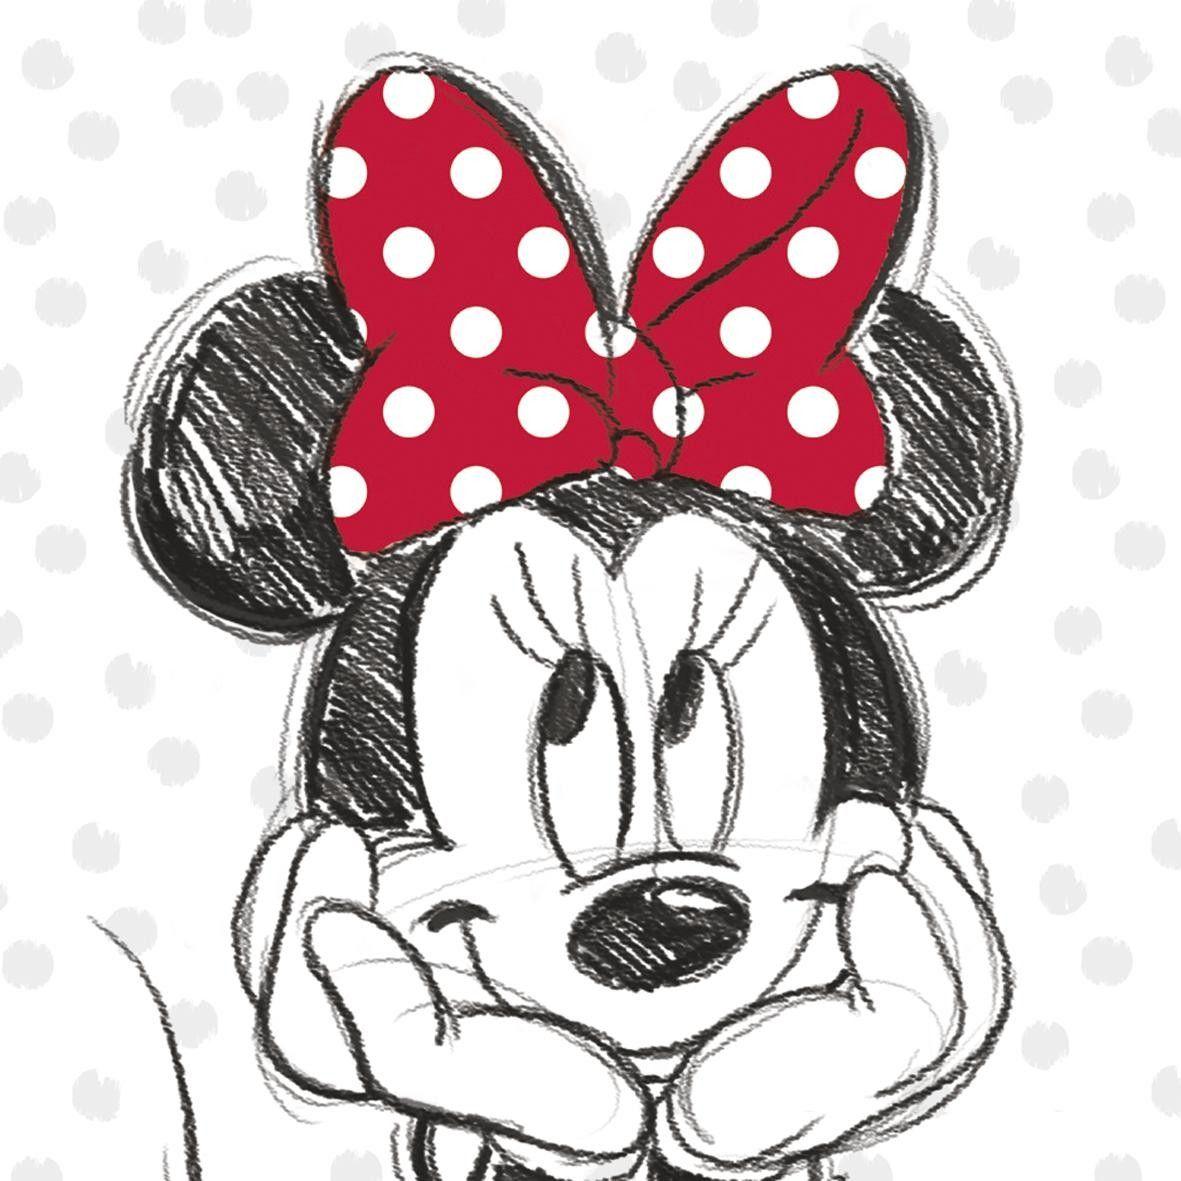 Keilrahmenbild Disney Ca 35x35cm Minnie Mouse Mickey